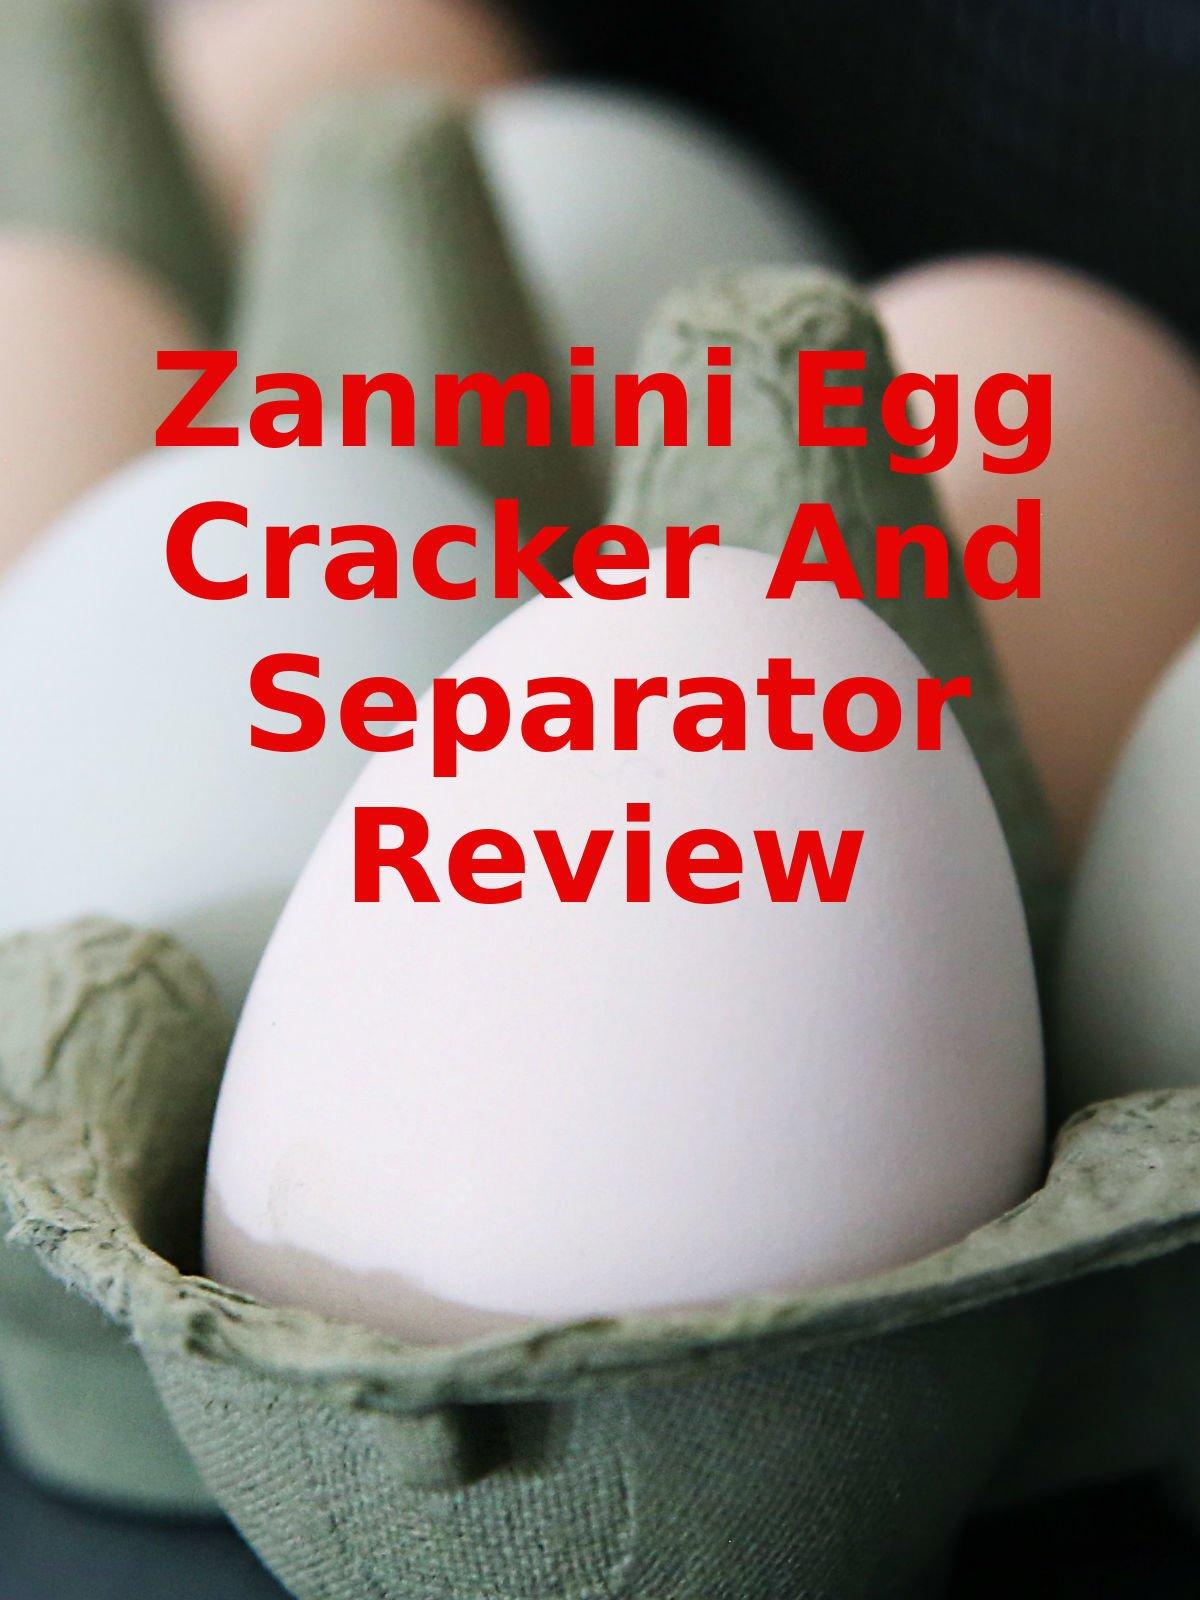 Review: Zanmini Egg Cracker And Separator Review